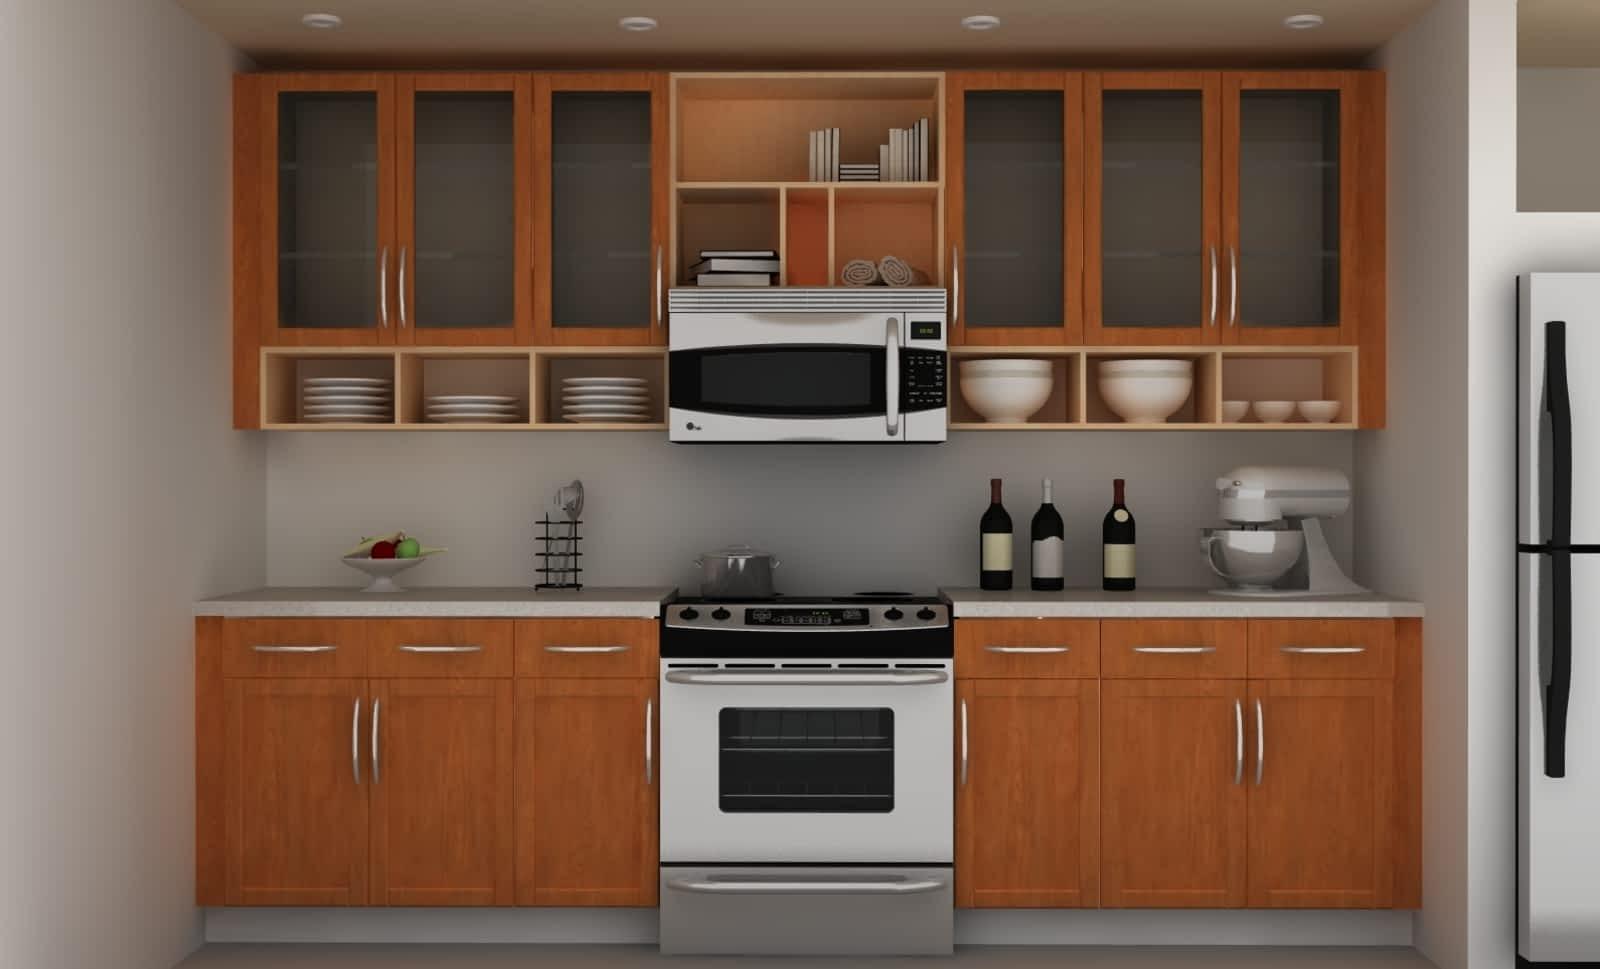 Florida Kitchen & Cabinet Custom Closet - Opening Hours - ON